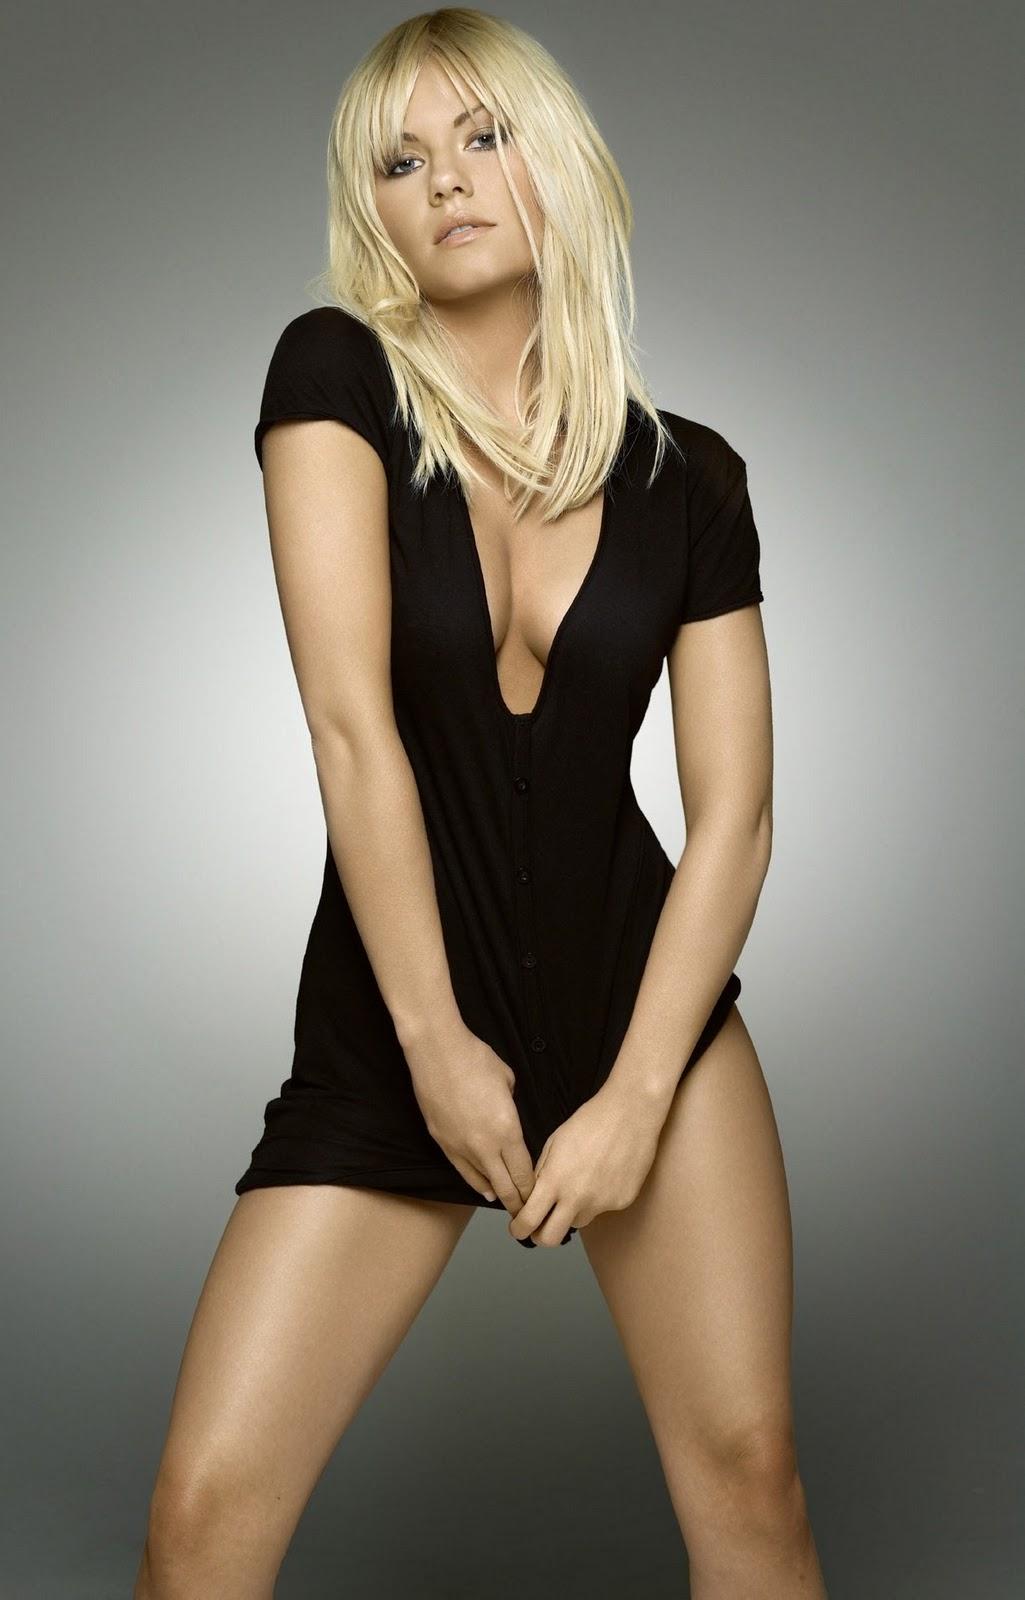 gorgeous actress elisha cuthbert - photo #9